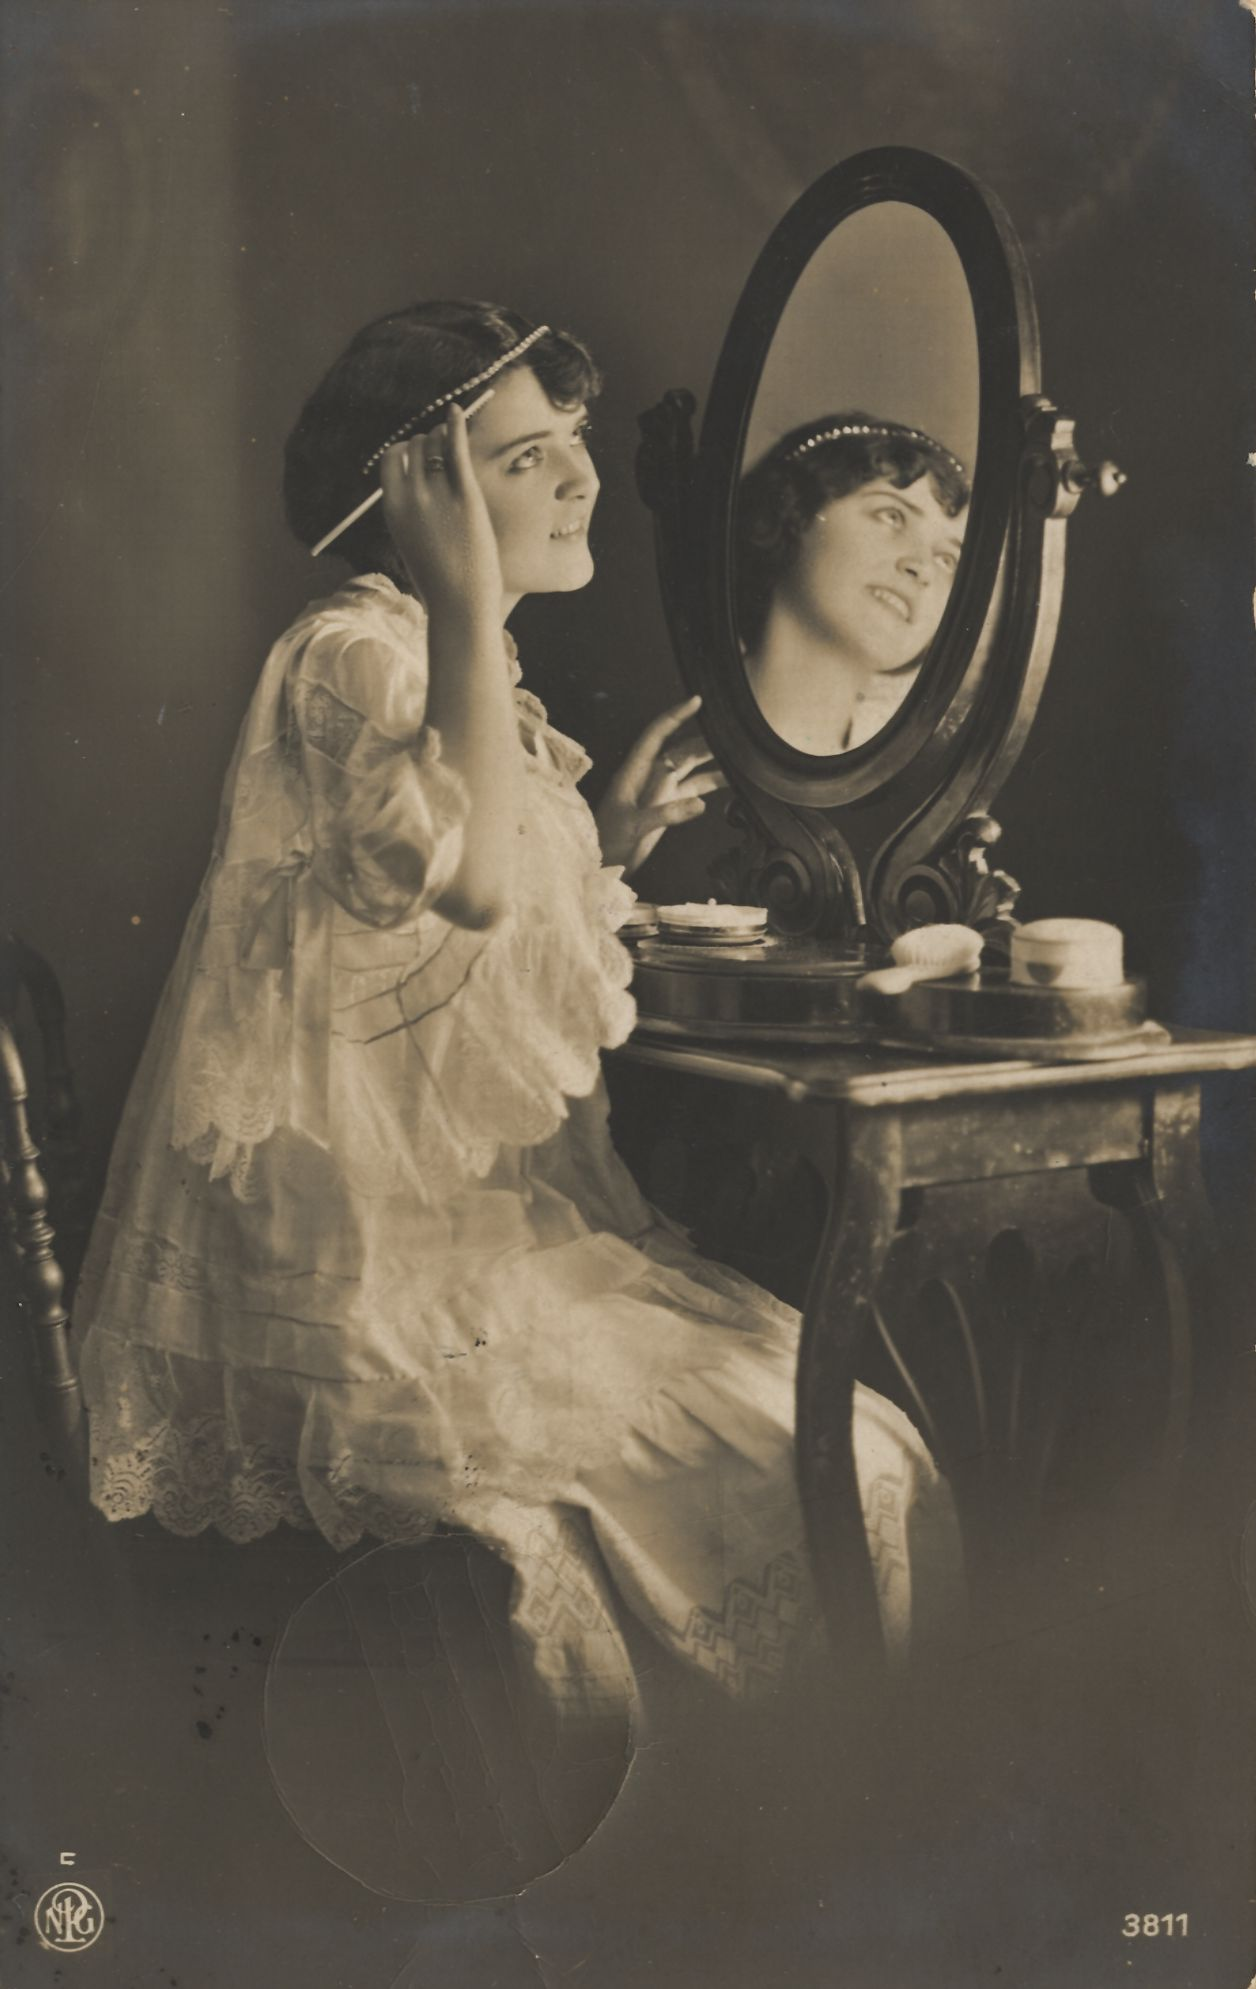 Vintage Woman In Boudoir By Mementomori Stock On Deviantart